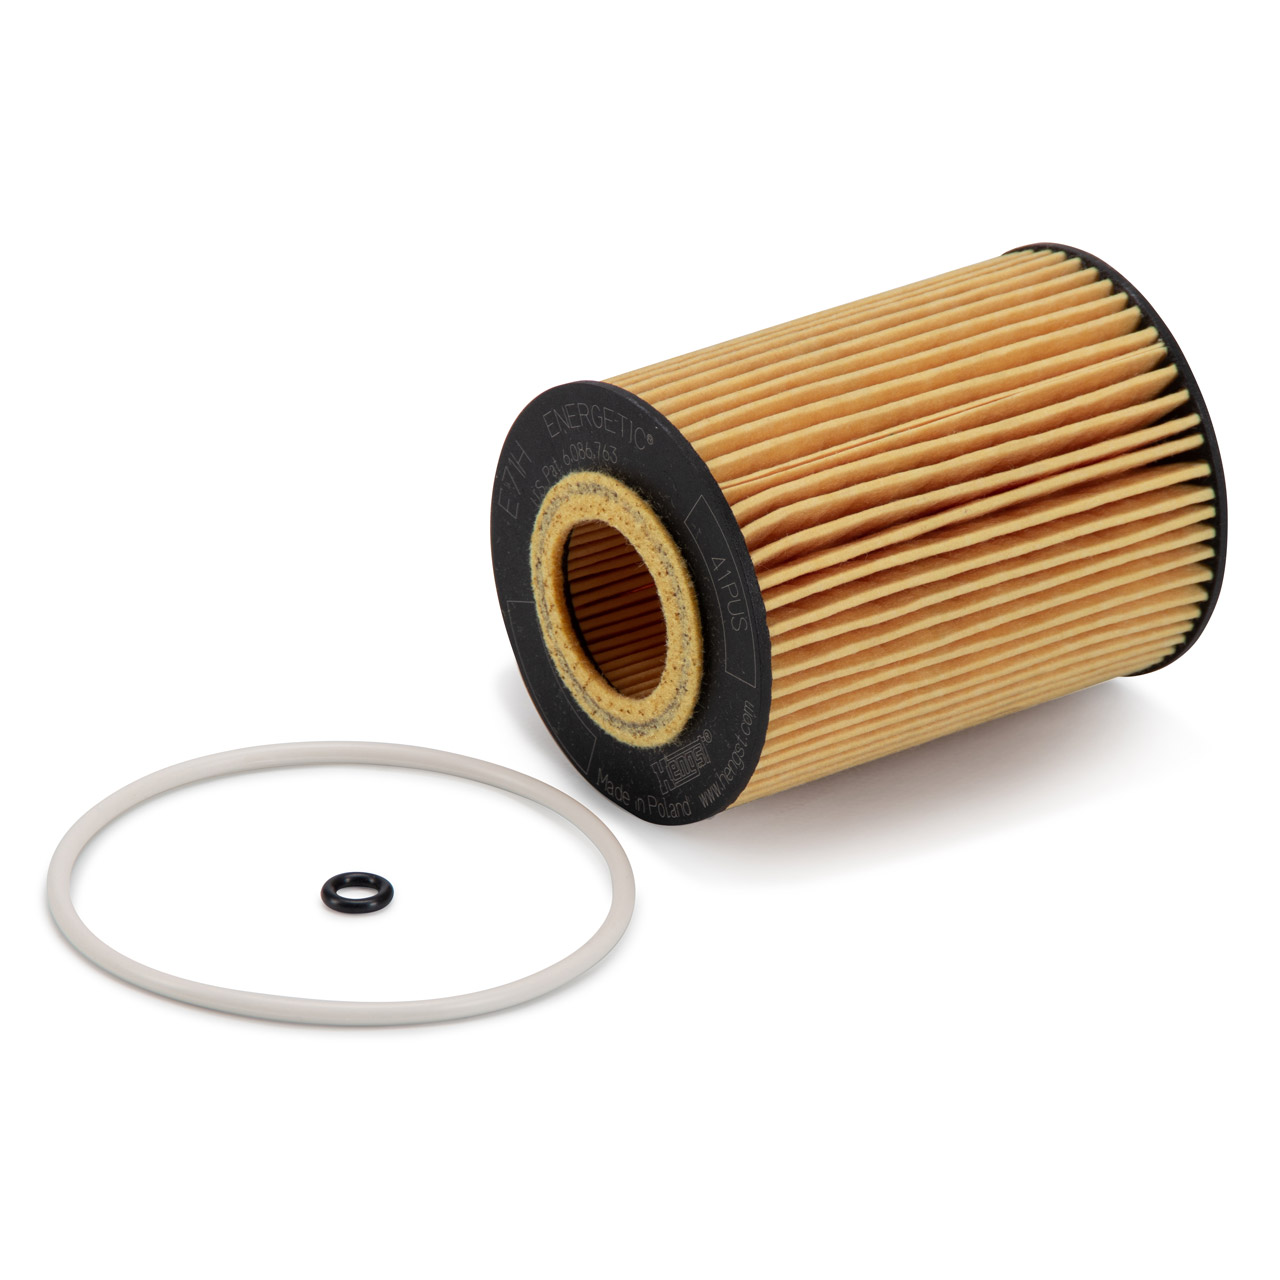 Filterpaket Filterset für MERCEDES W204 S204 C-KLASSE 320 CDI 224 PS